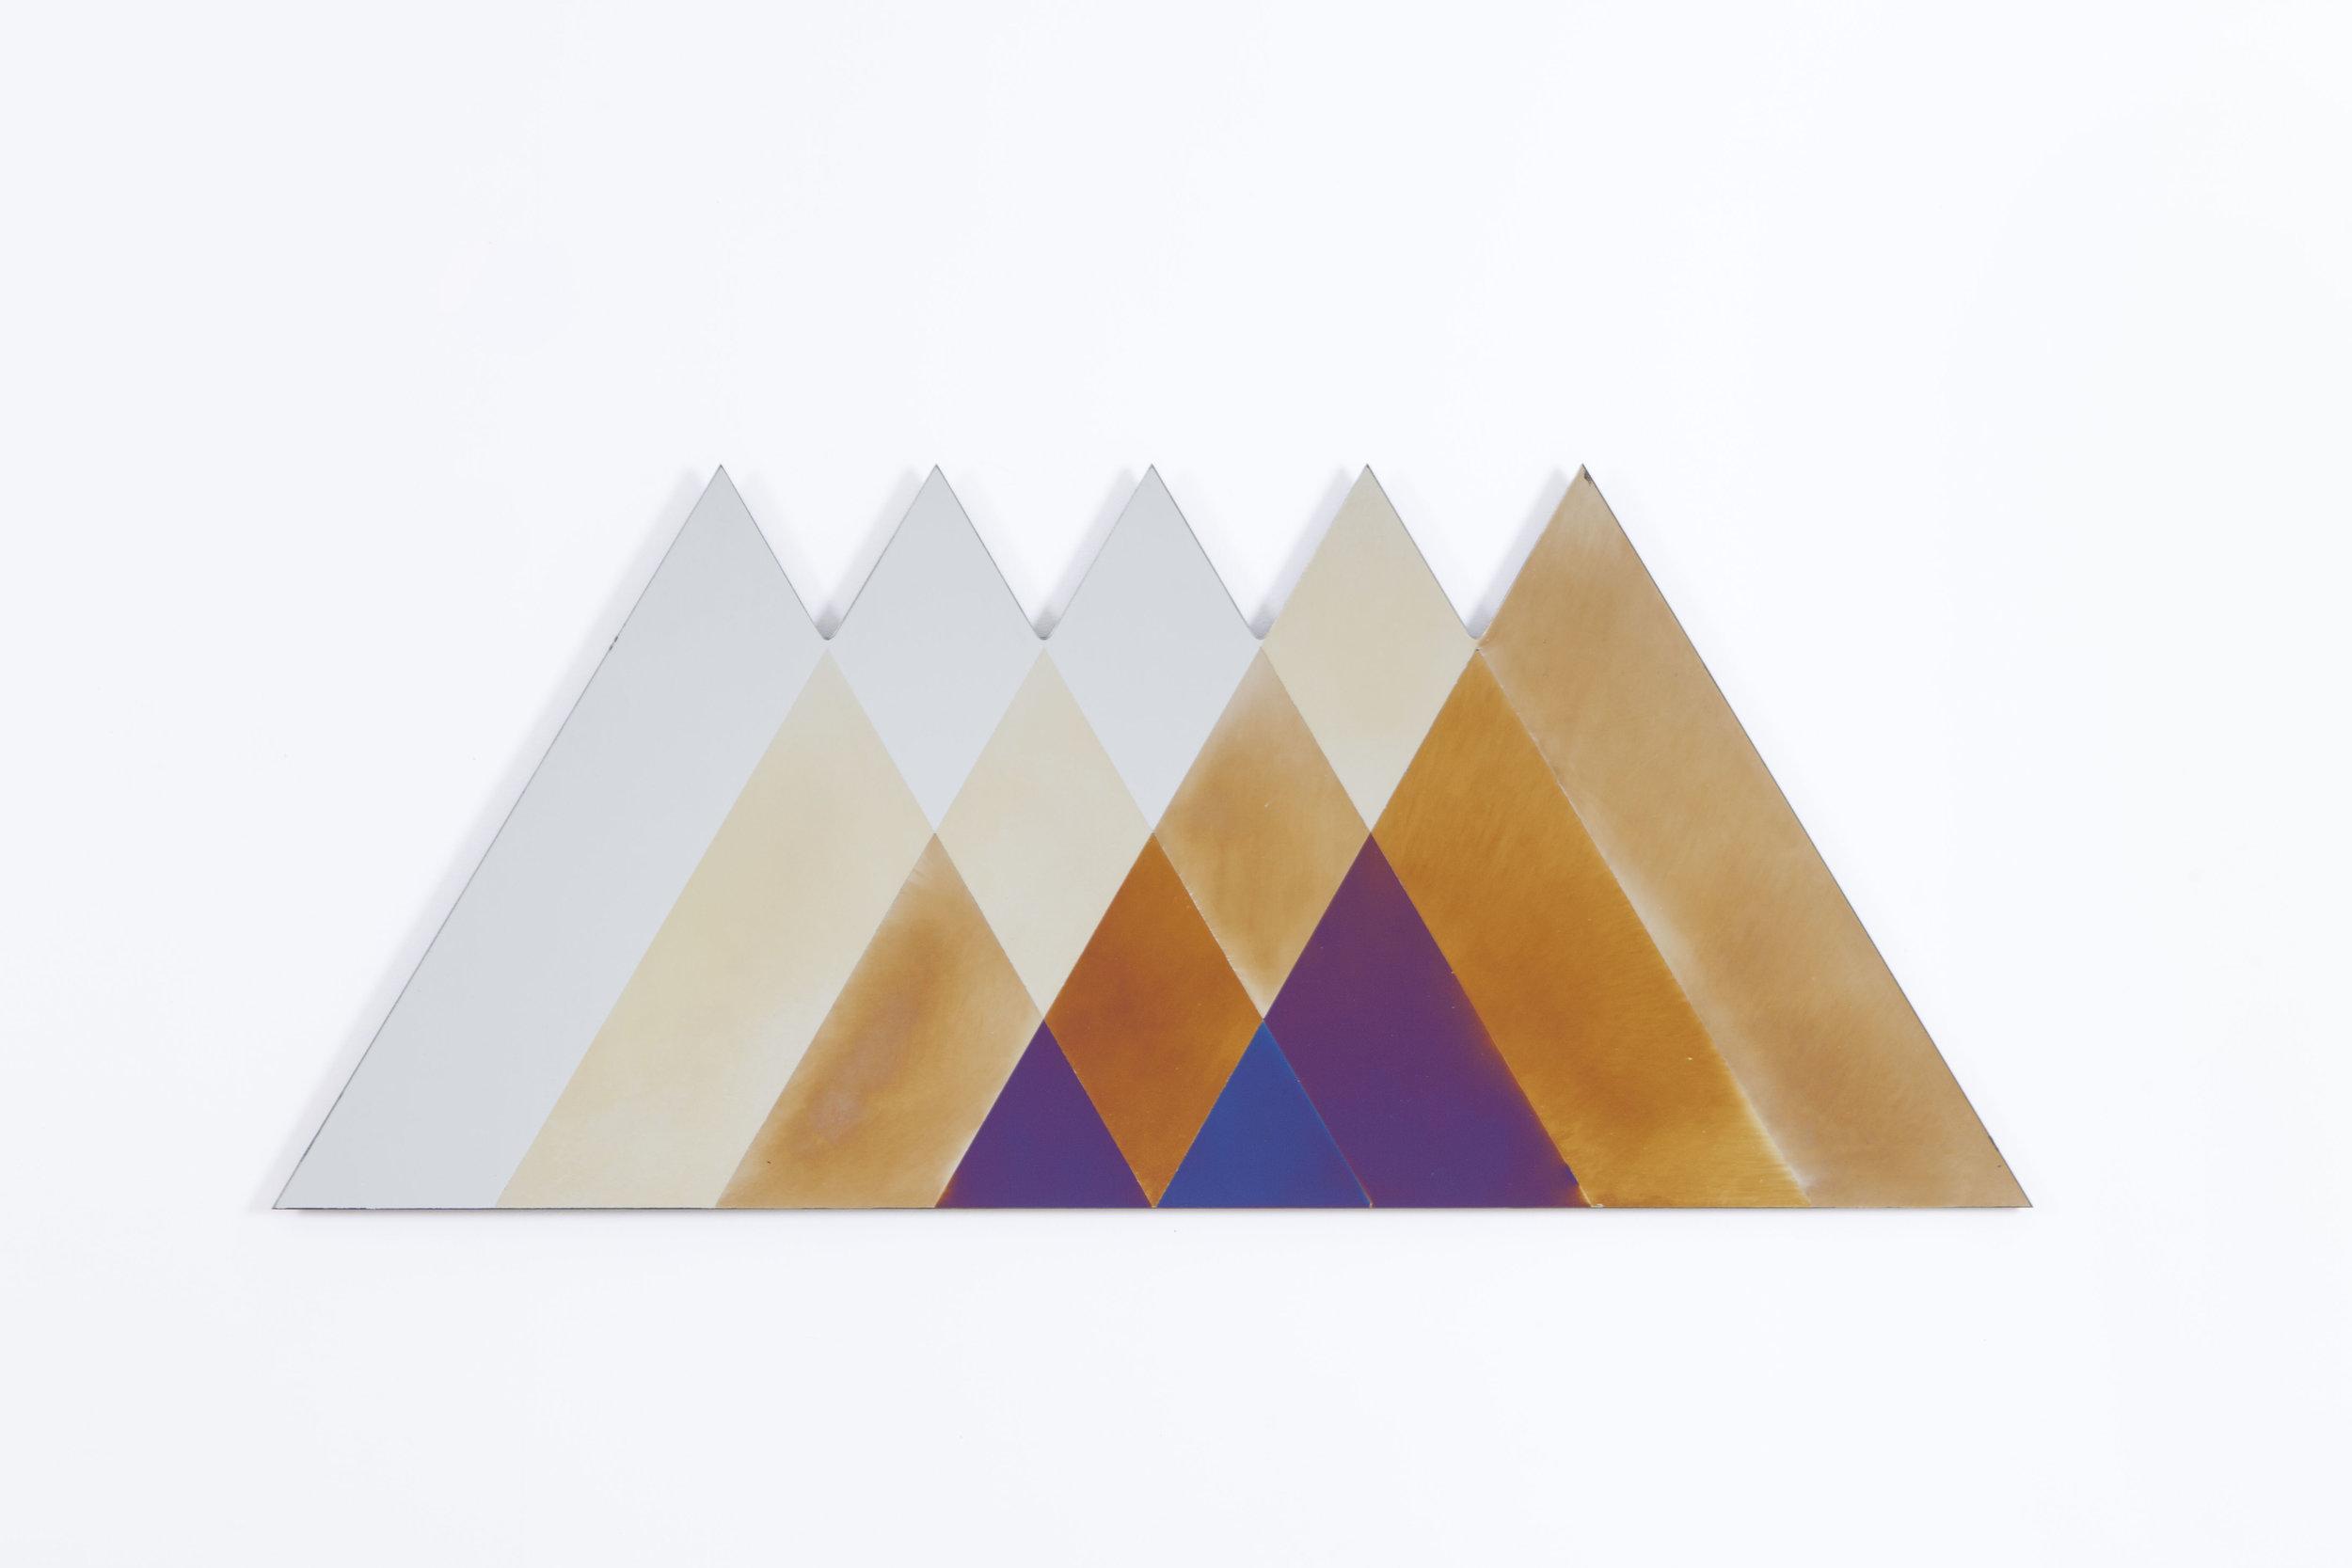 transnatural_Transience_mirror_triangle_byfloorknaapen_03.jpg